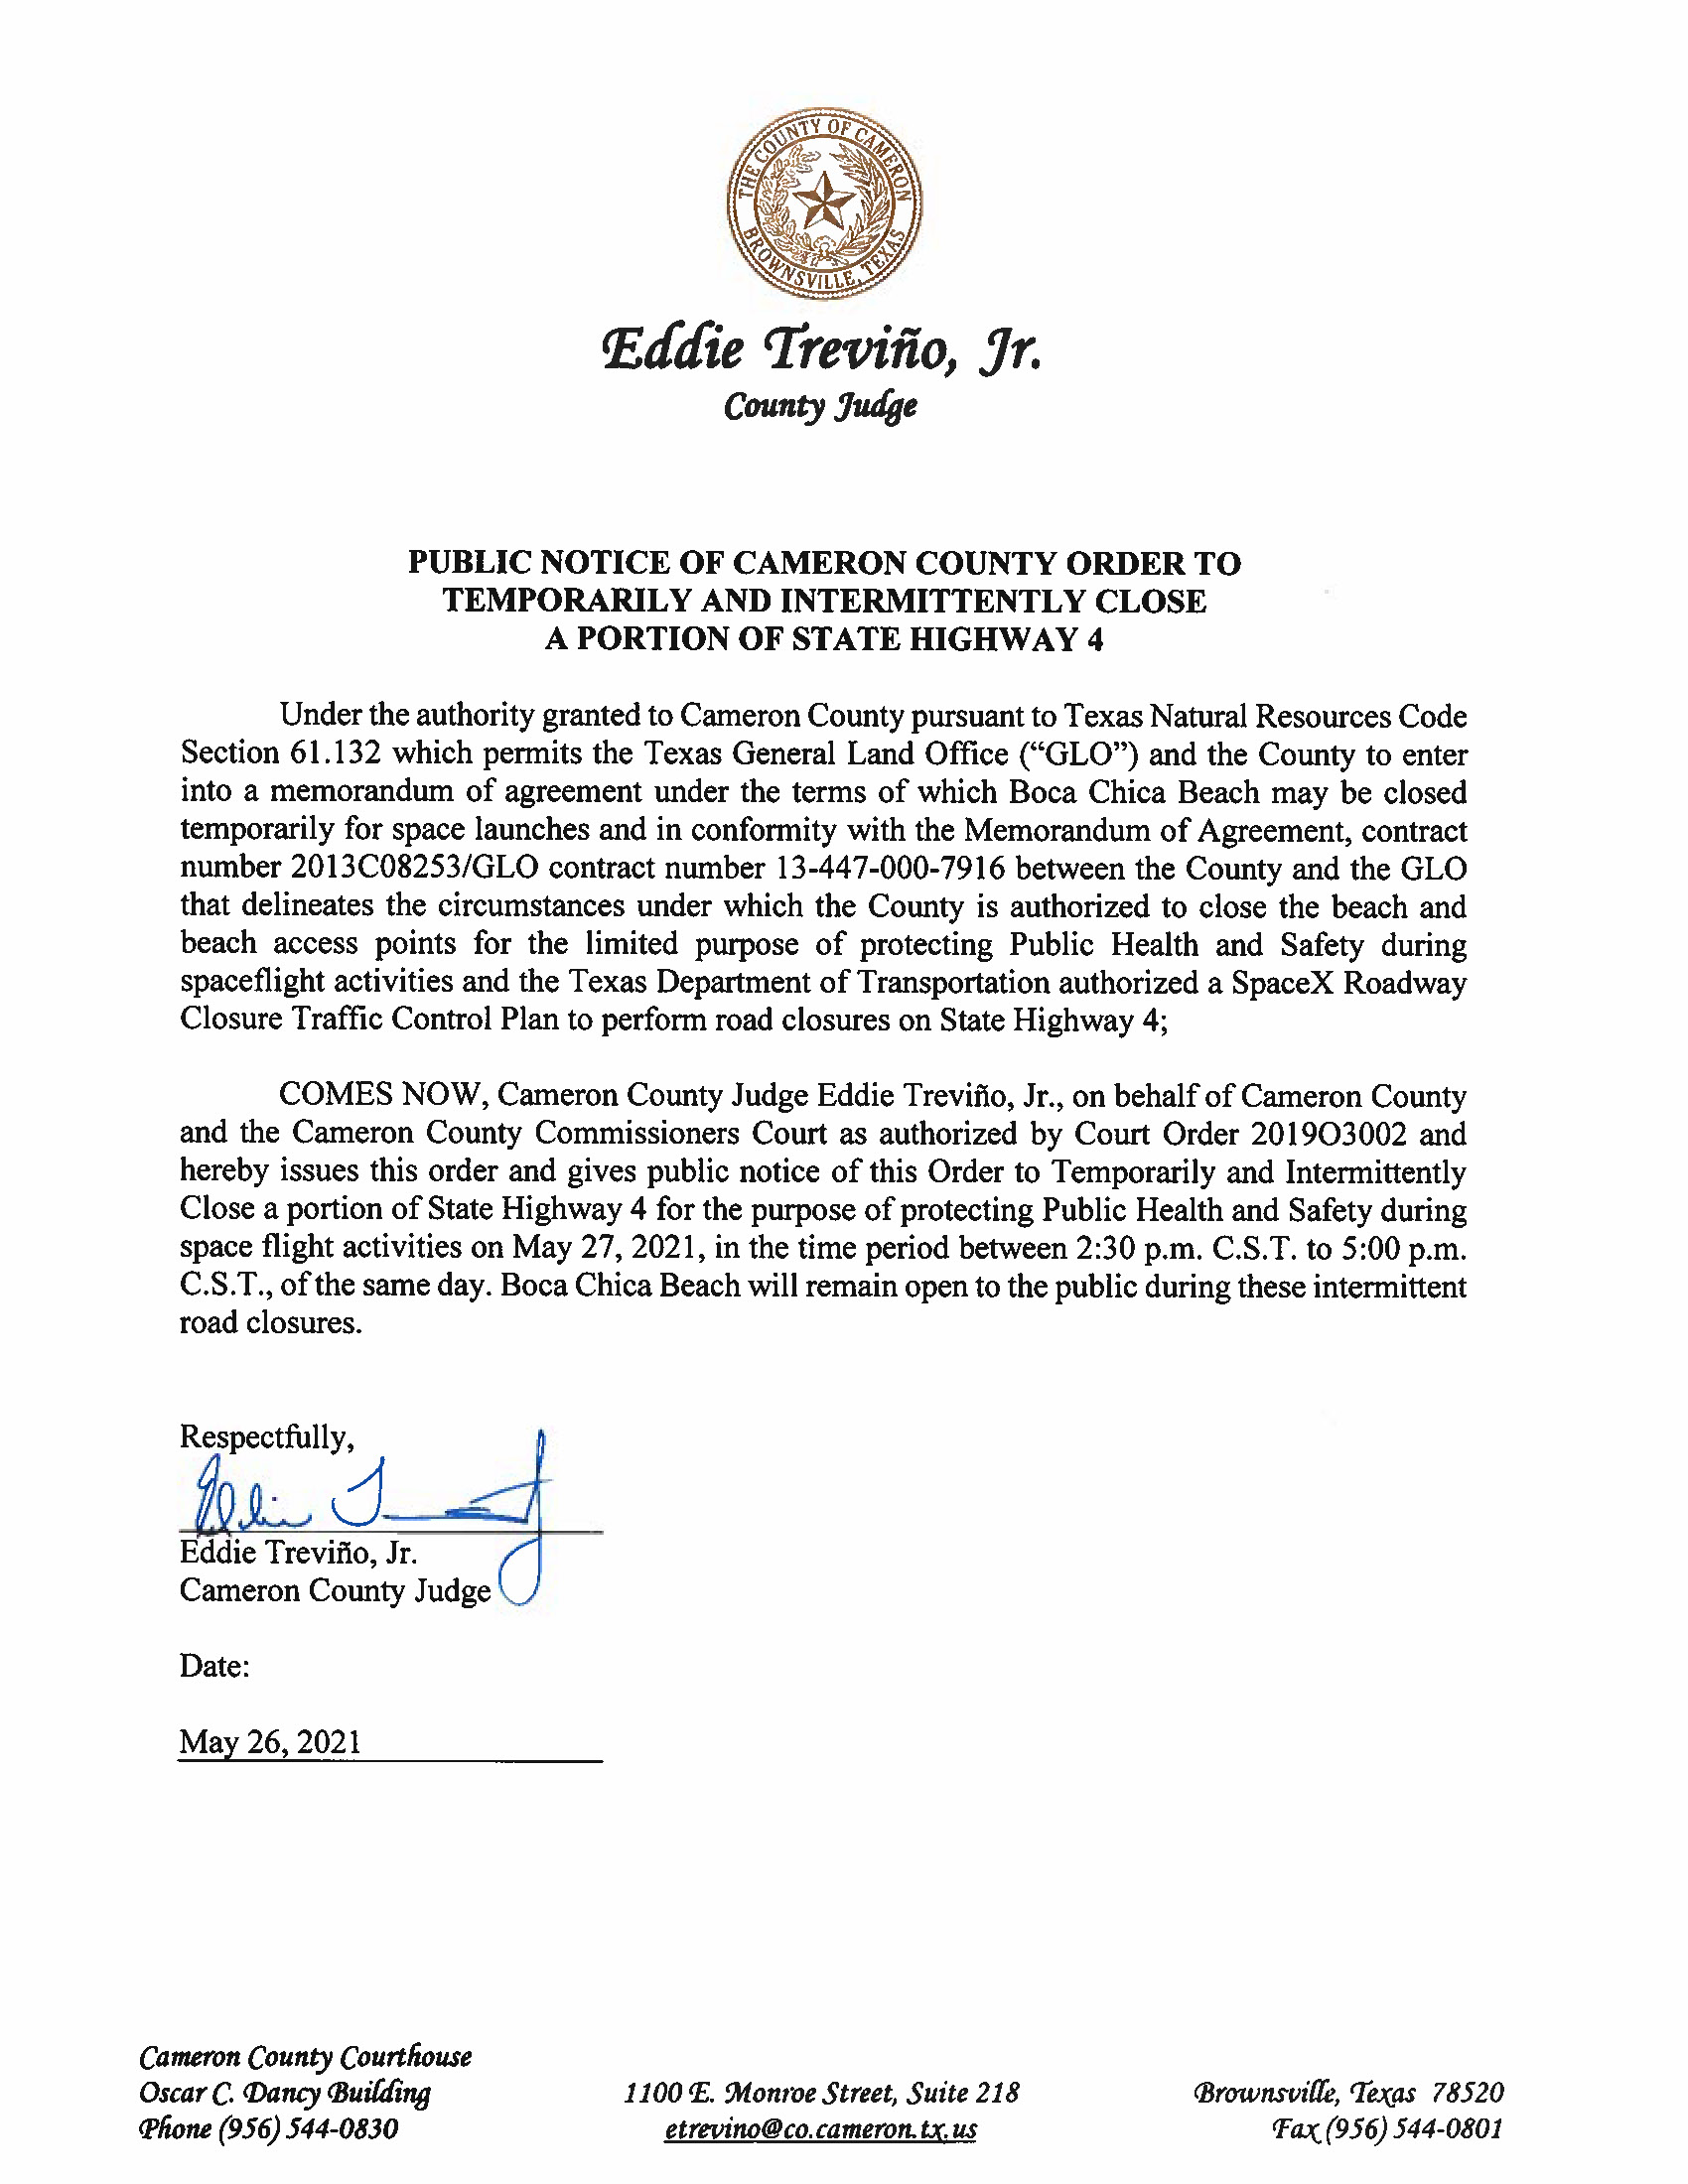 PUBLIC NOTICE OF CAMERON COUNTY ORDER TO TEMP. ROAD CLOSURE. 05.27.2021